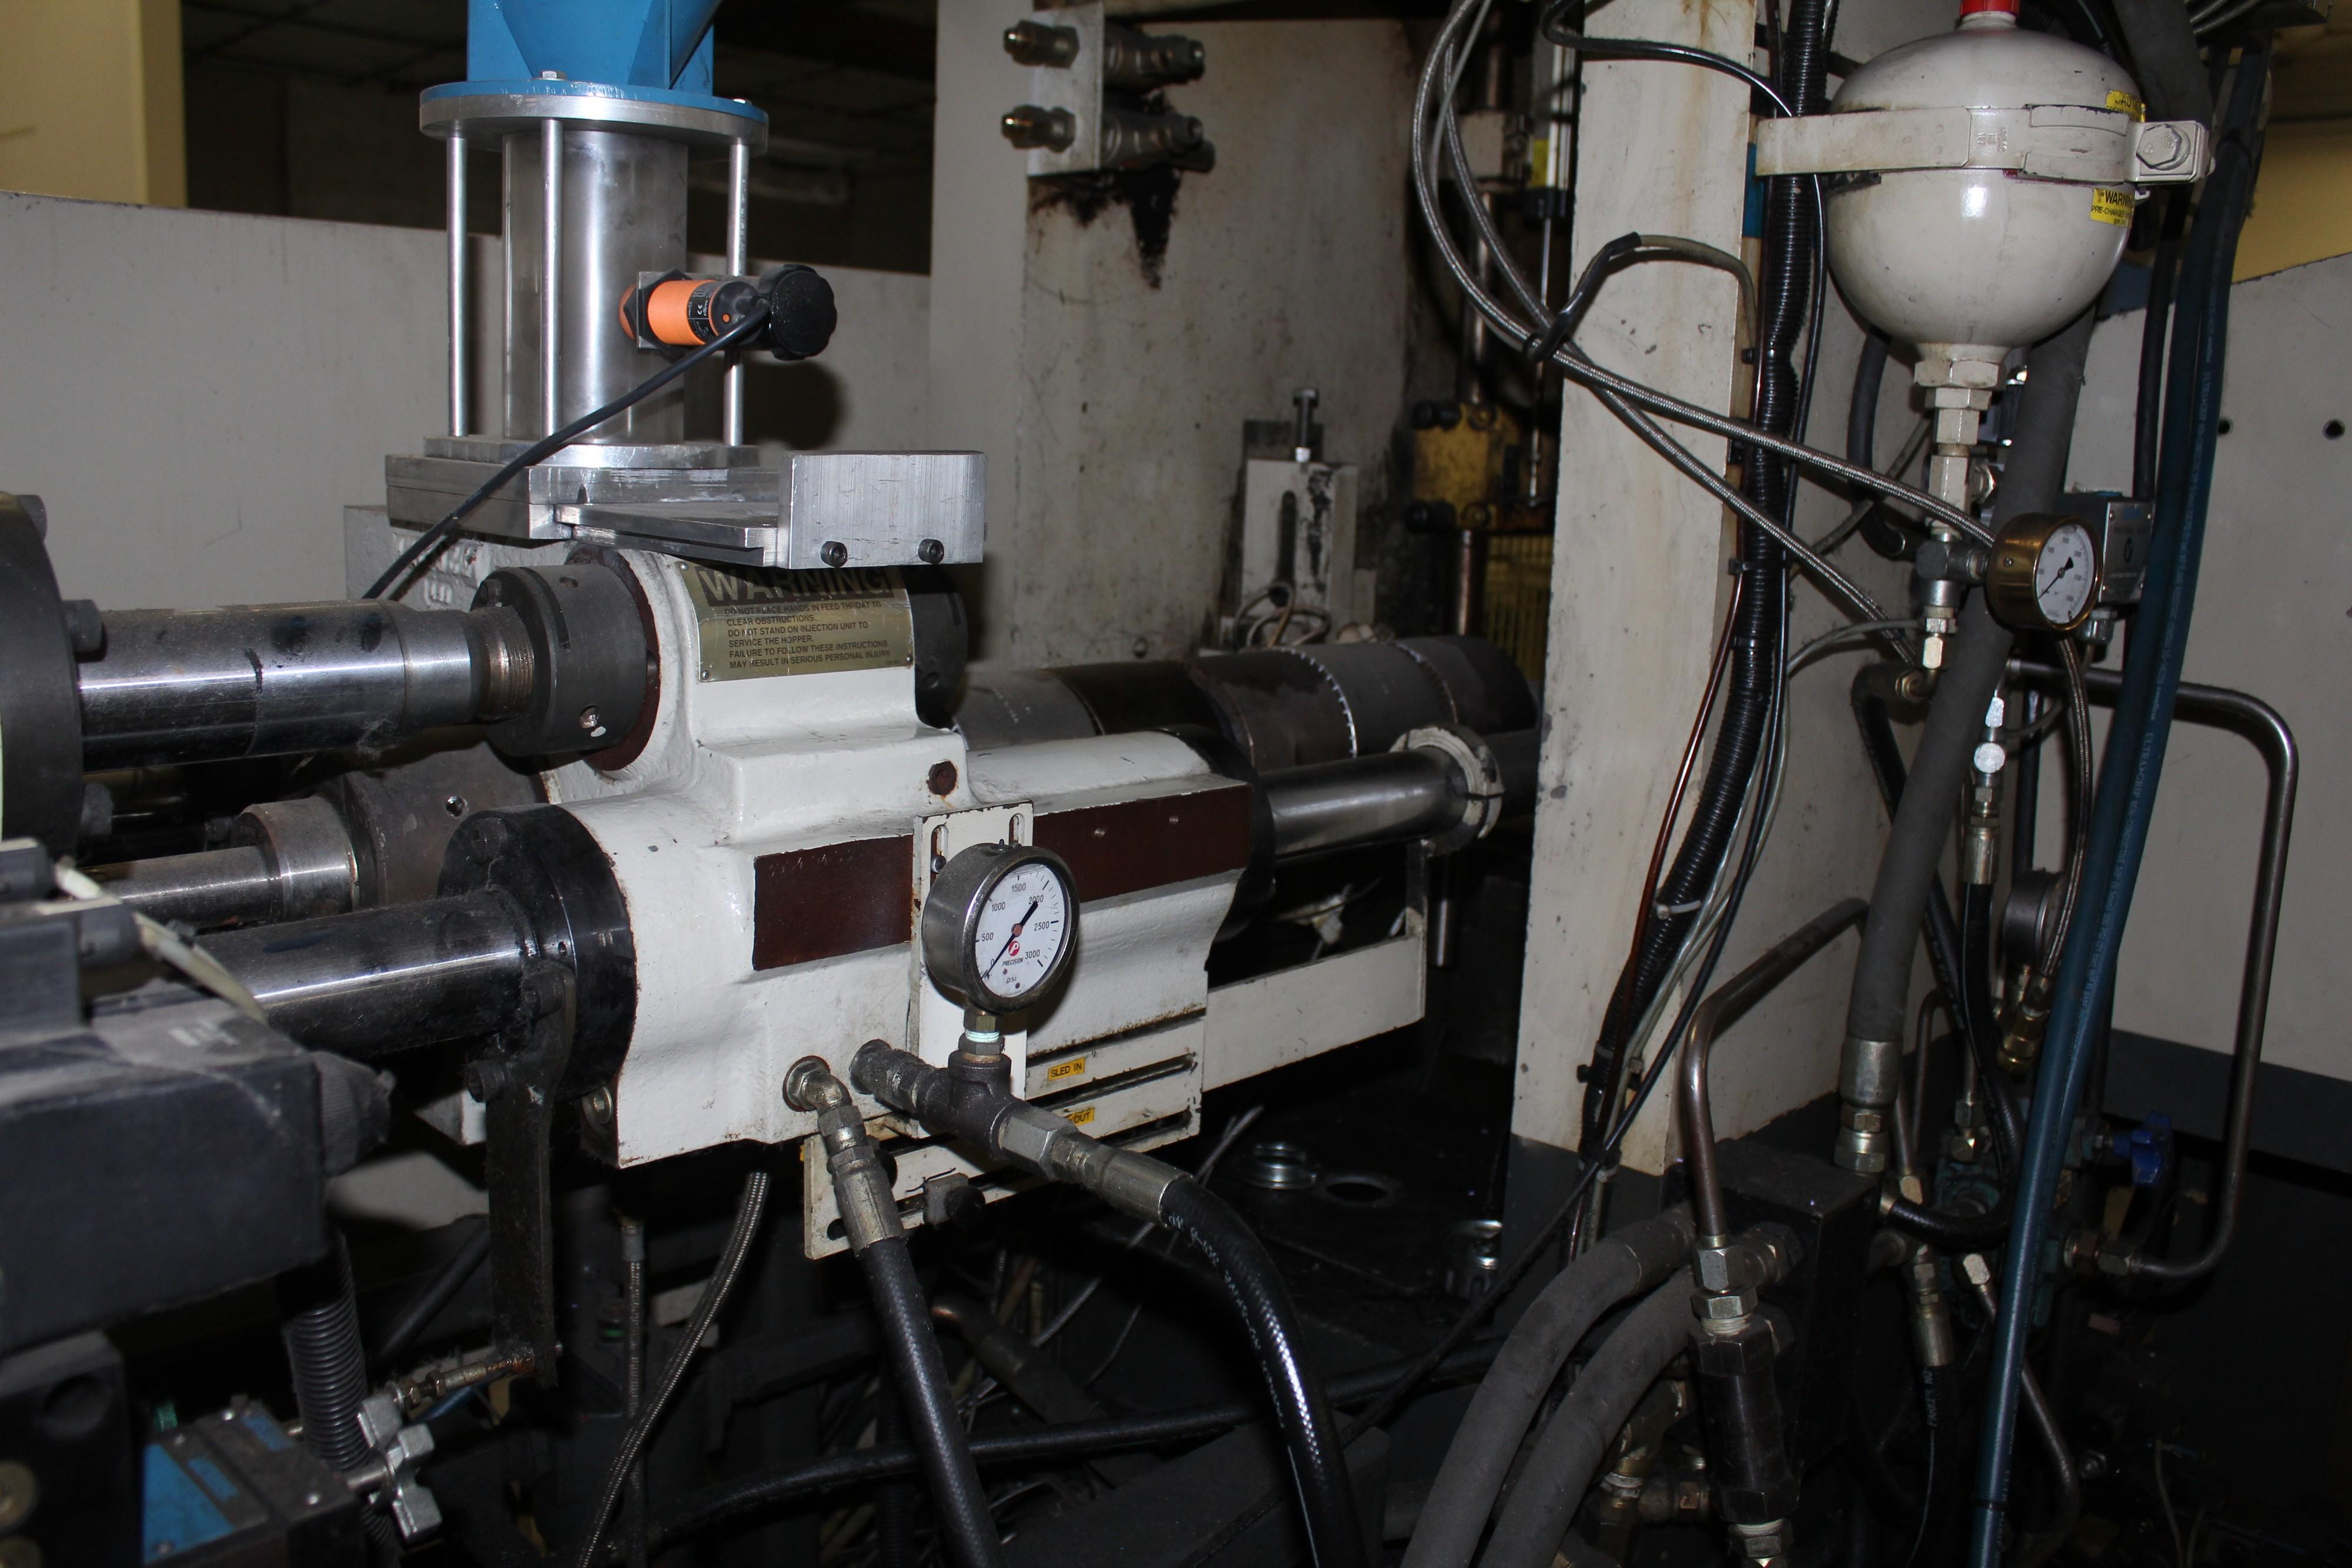 cincinnati milacron operating quick help manual Array - 90 ton cincinnati  rotary table vertical injection molding machine mo rh bidspotter com